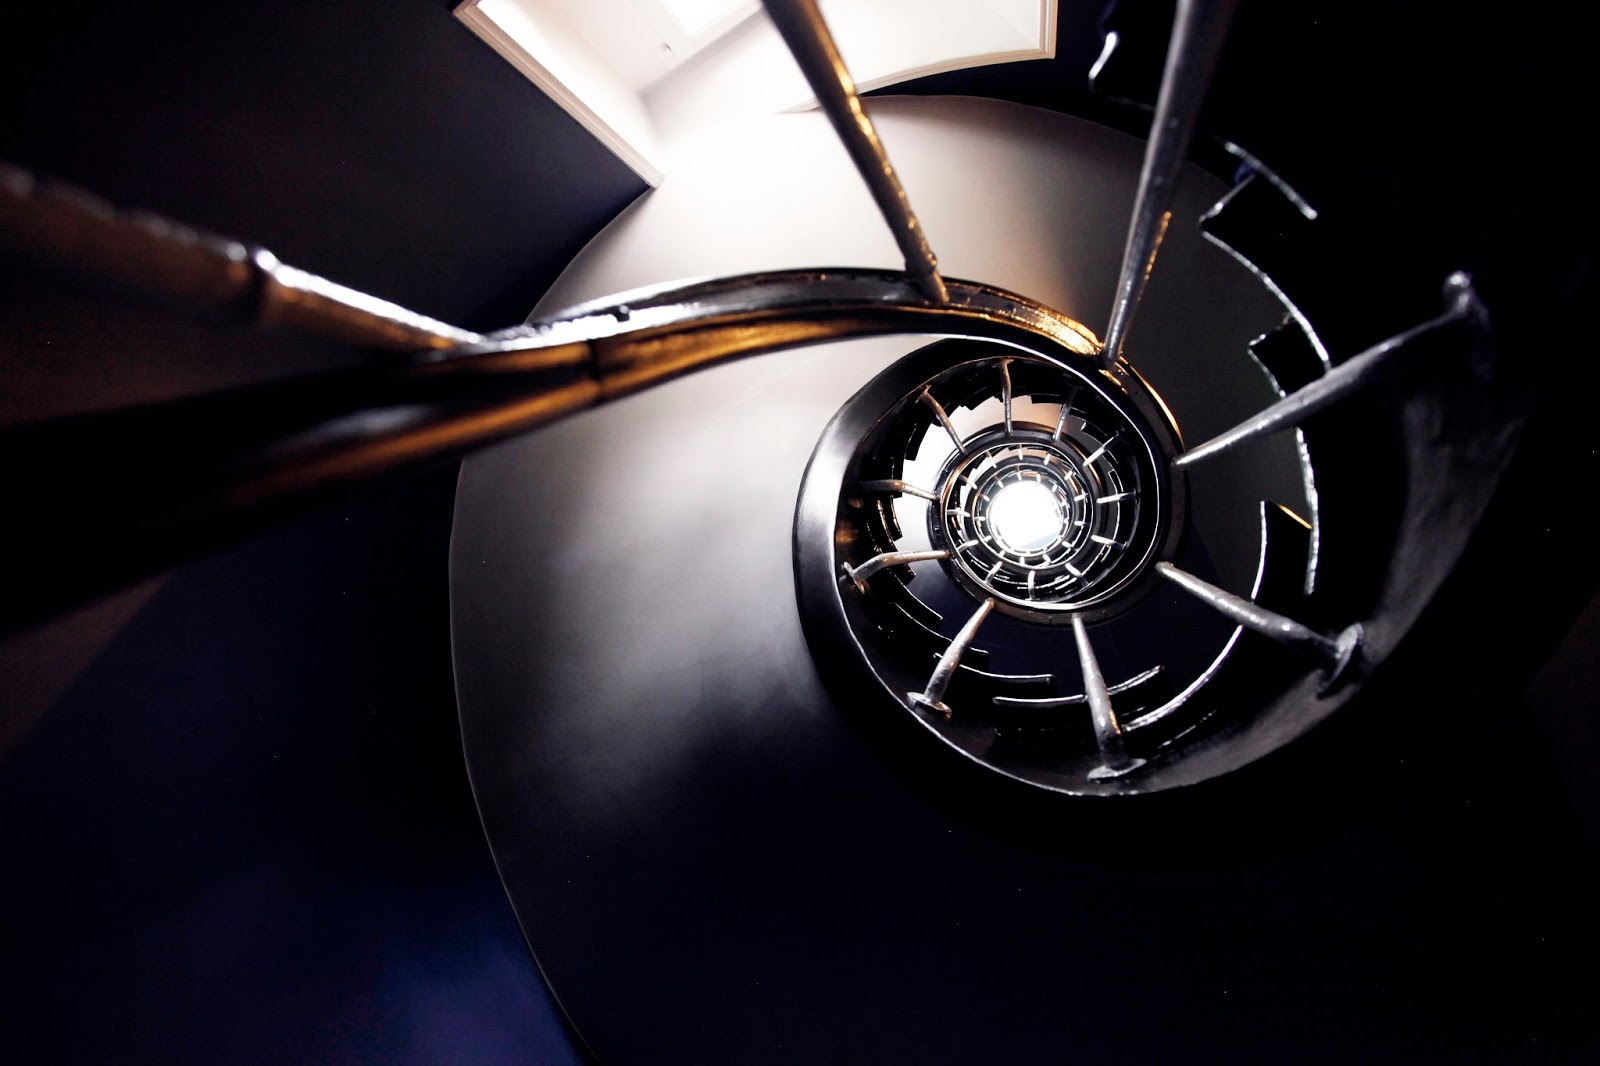 CIRCU_COPYRIGHT_PLANDA_ARCHITECTES_PARIS_RENDEZ_VOUS_HOTEL_BATIGNOLLES_PARIS_DESIGN_MG_4390